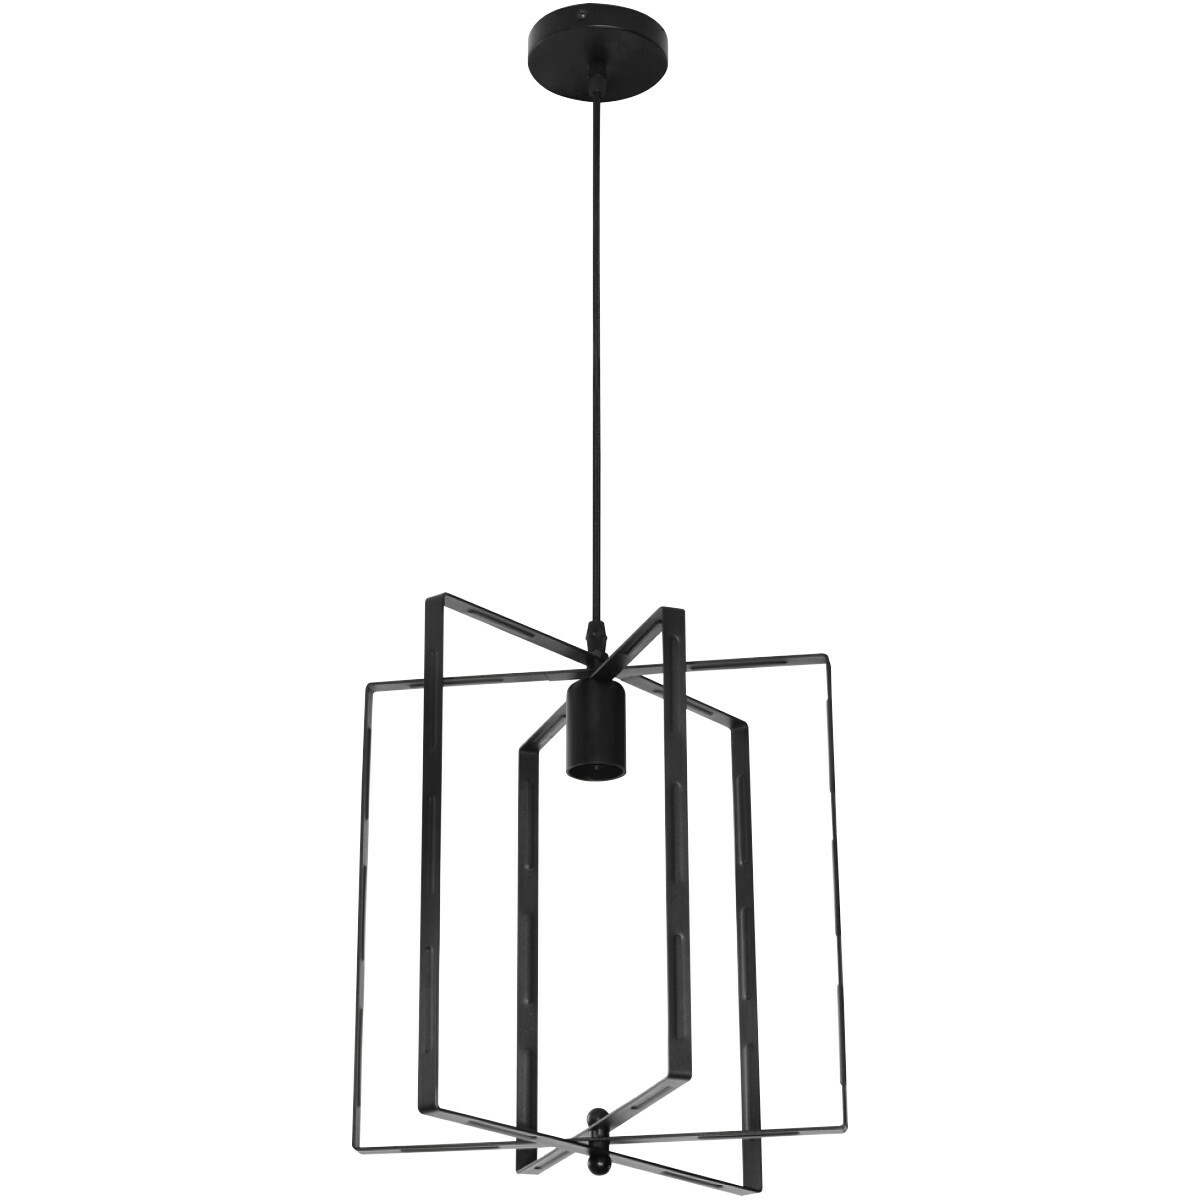 PHILIPS - LED Hanglamp - CorePro LEDbulb 827 A60 - Noby Industrieel - E27 Fitting - 8W - Warm Wit 27